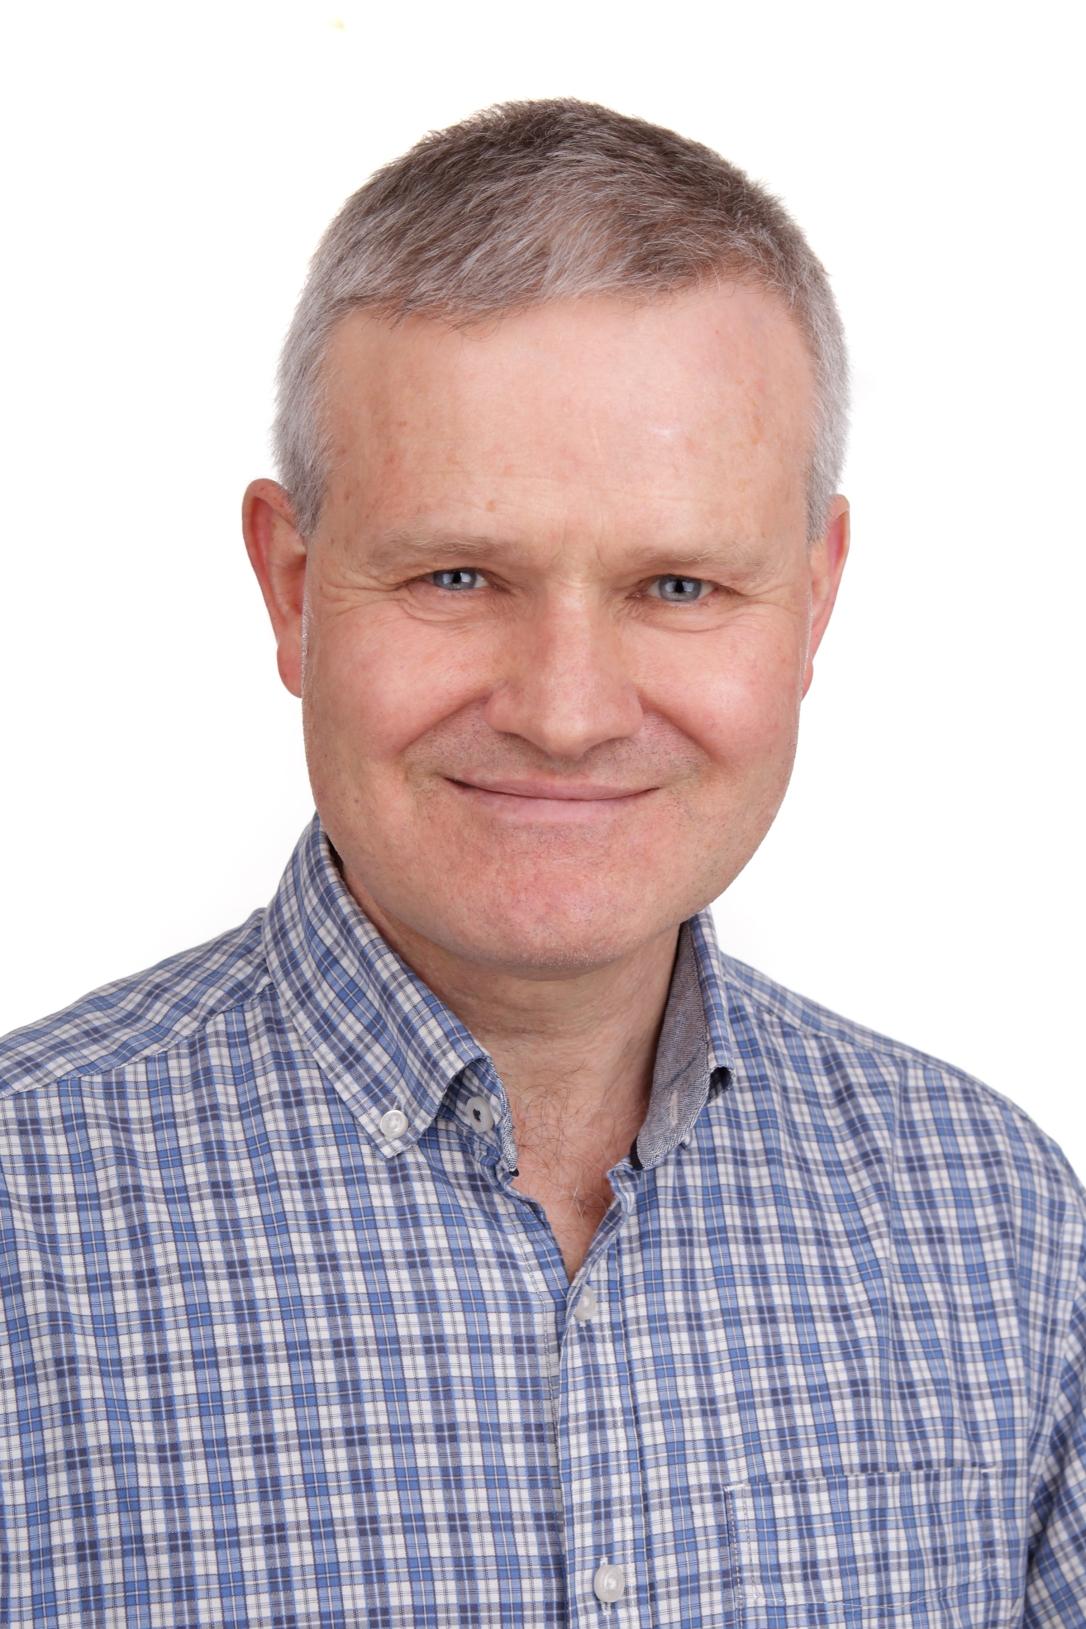 Meet the PR blogger - Richard Bailey